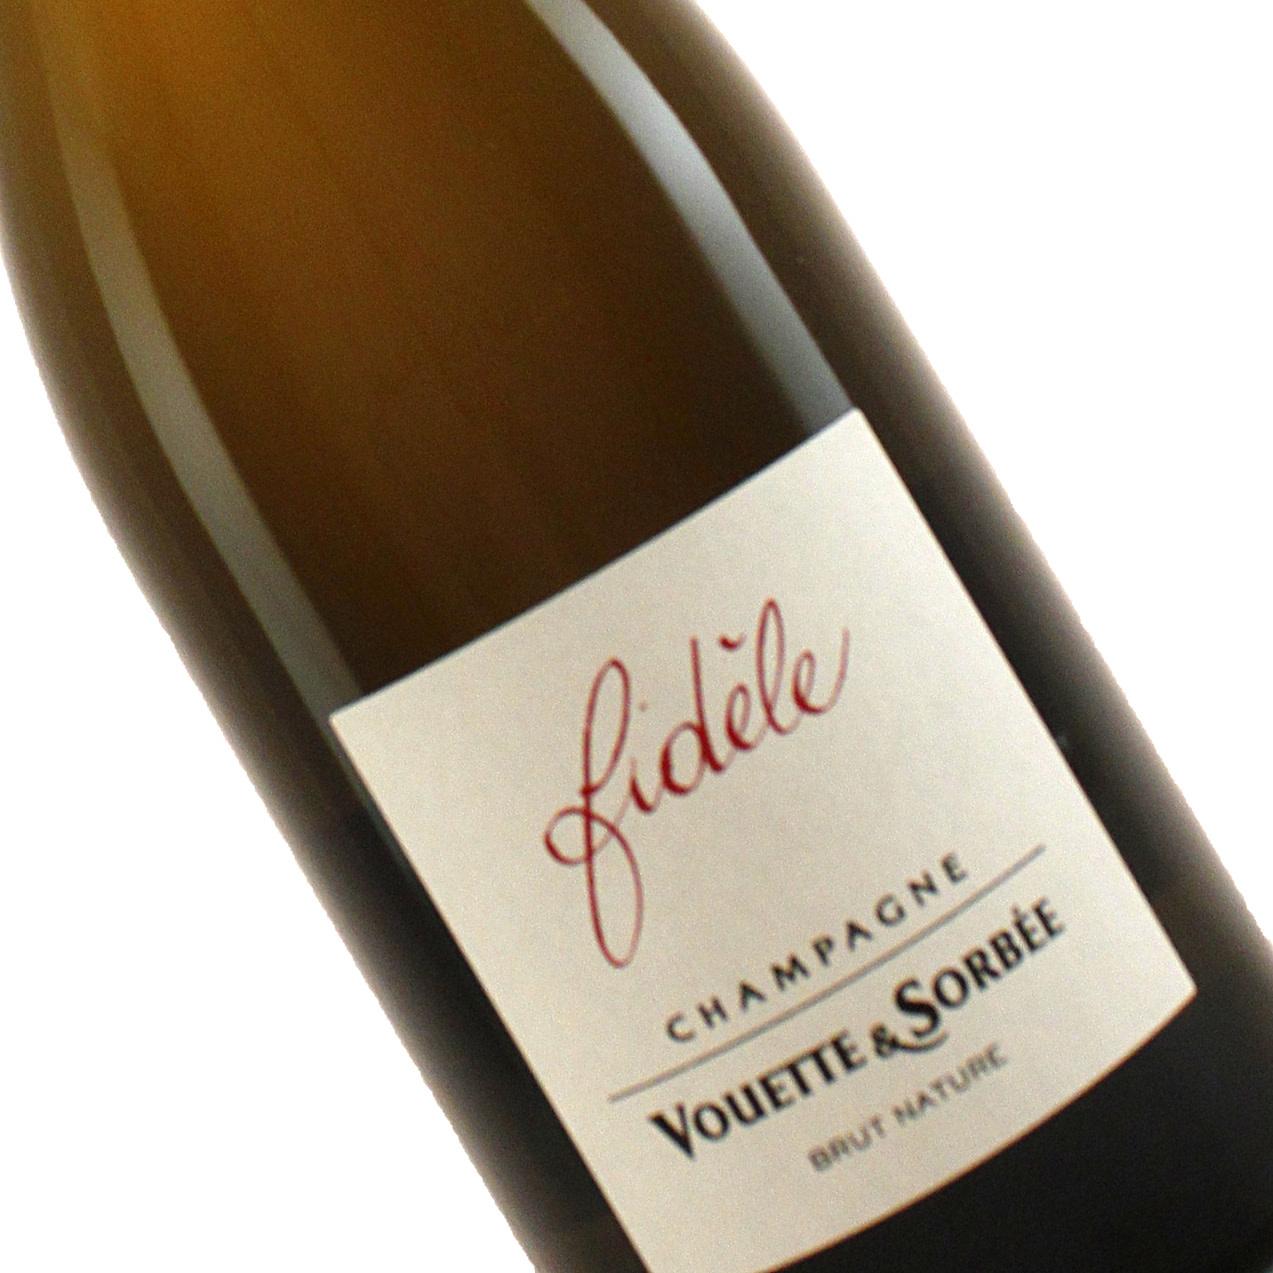 "Vouette & Sorbee N.V. Champagne ""Fidele"" Brut Nature"